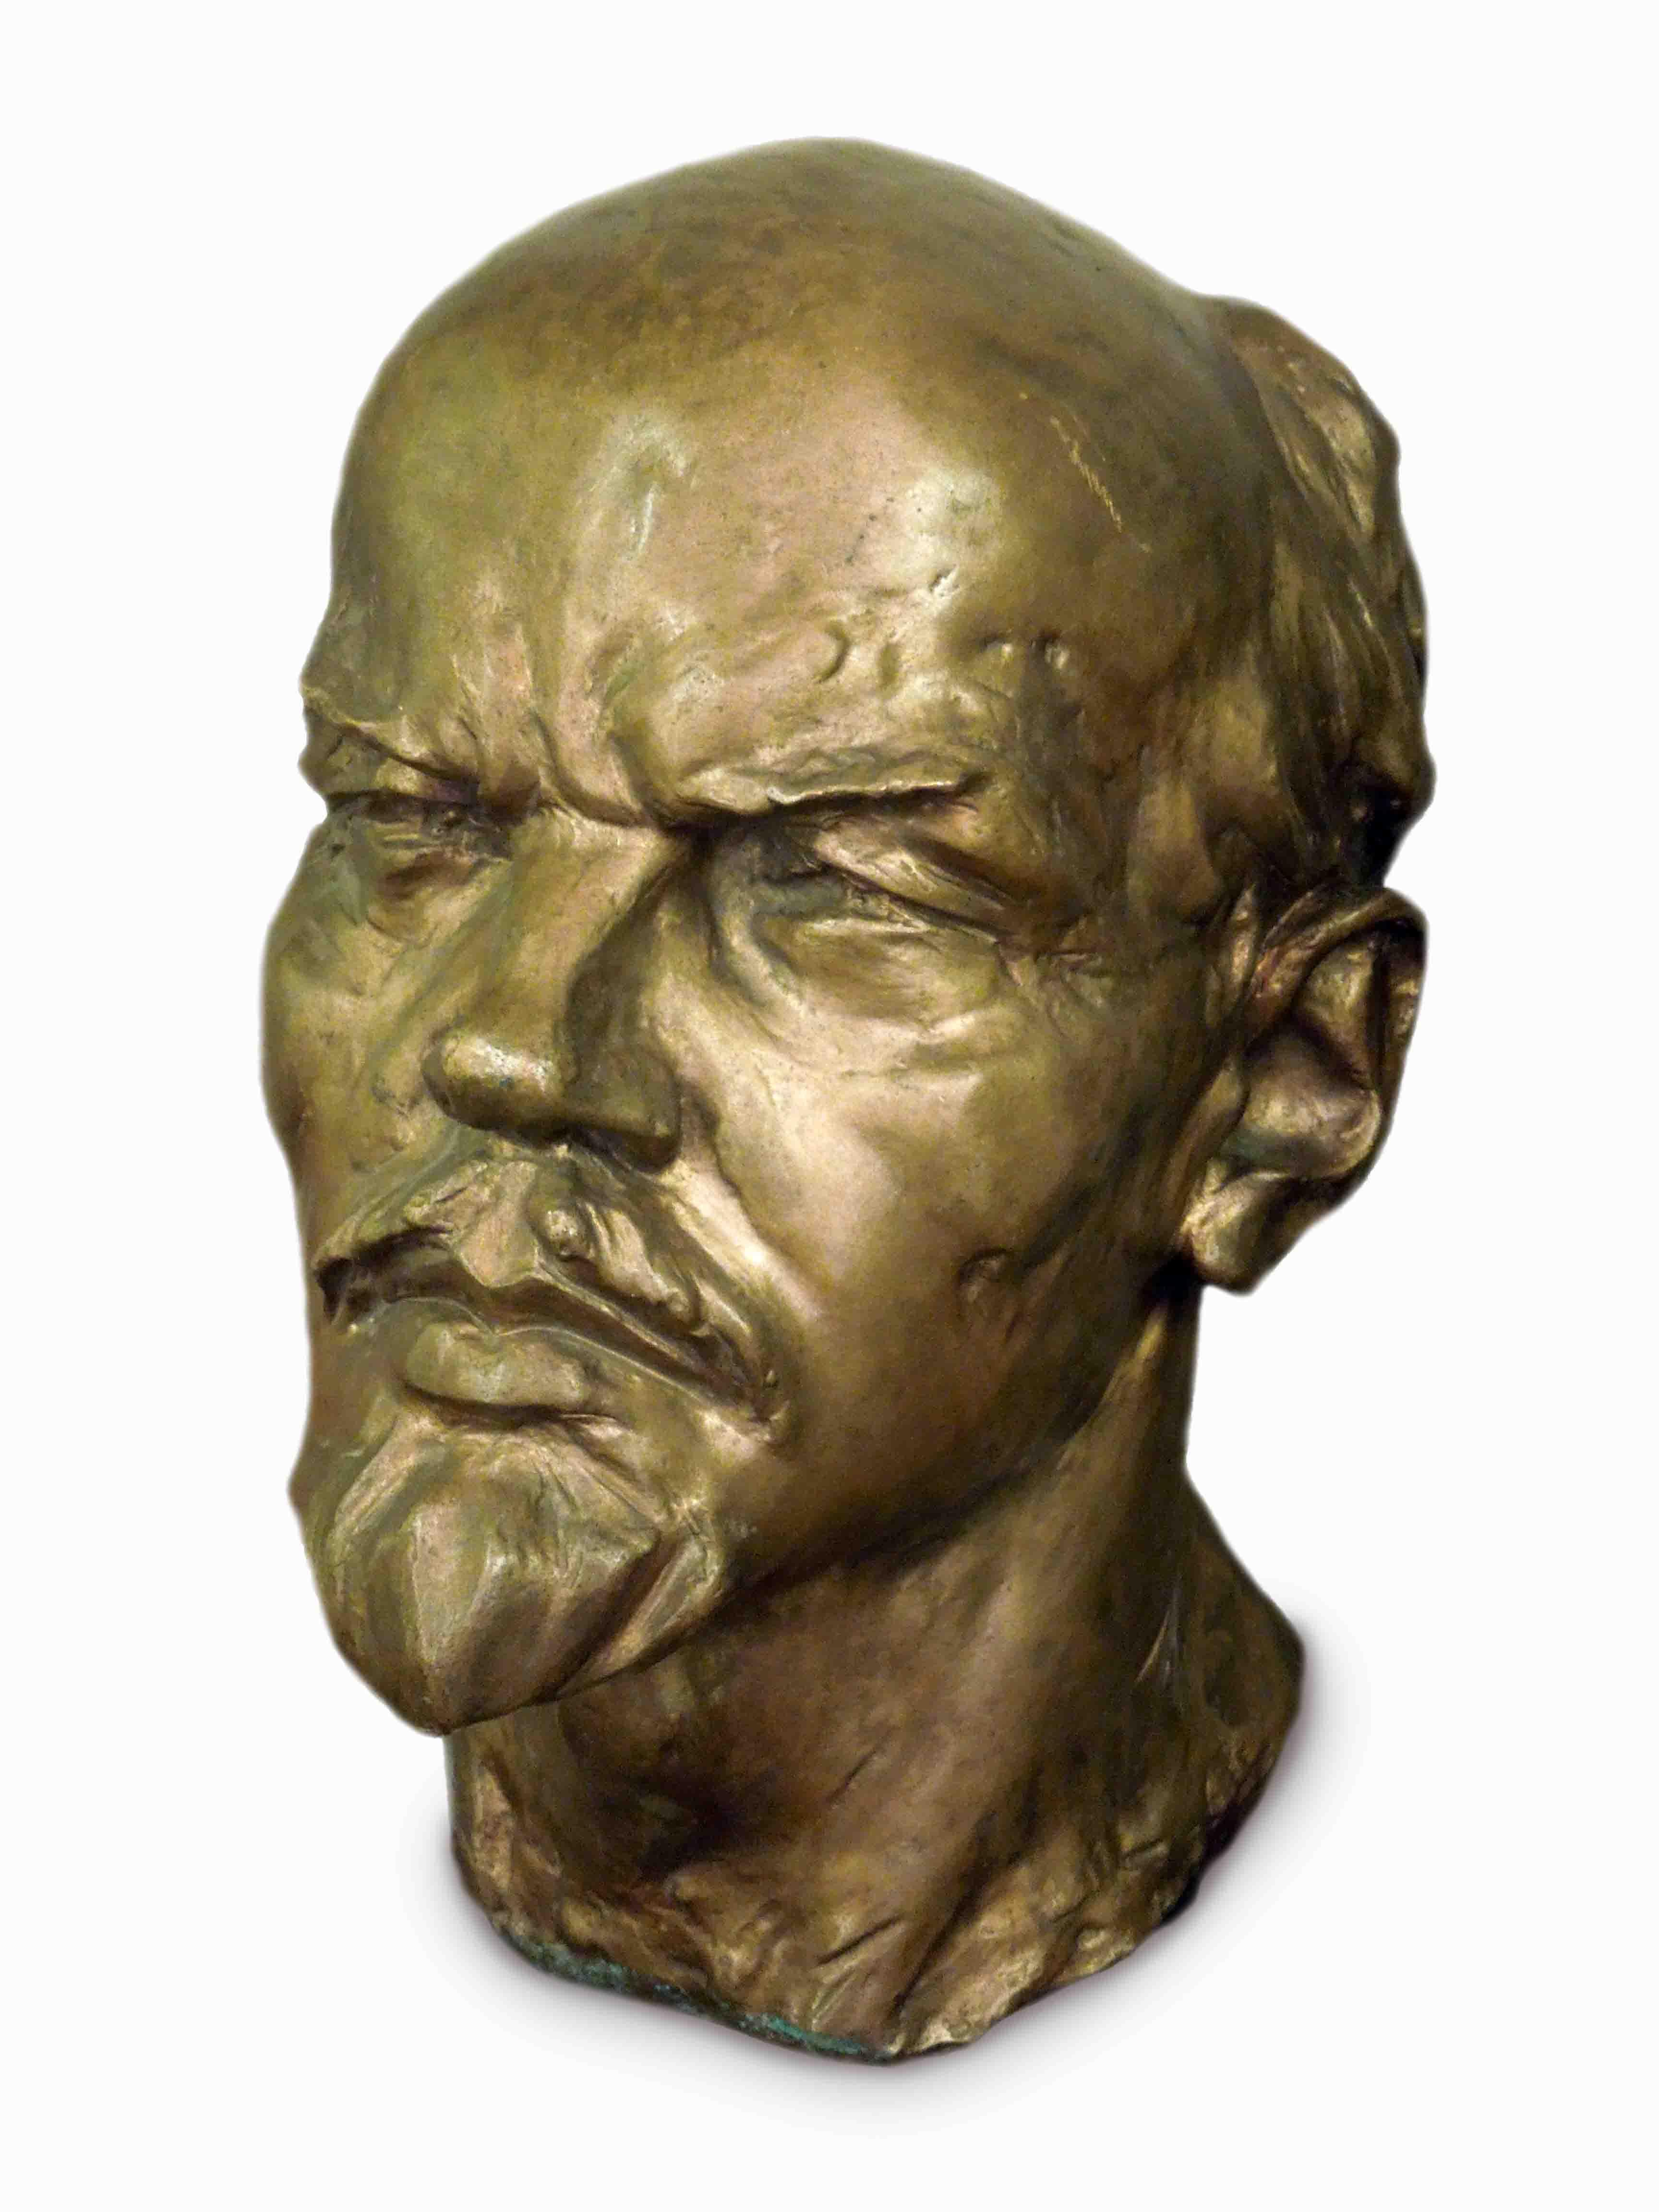 JAN LAUDA, V. I. Lenin